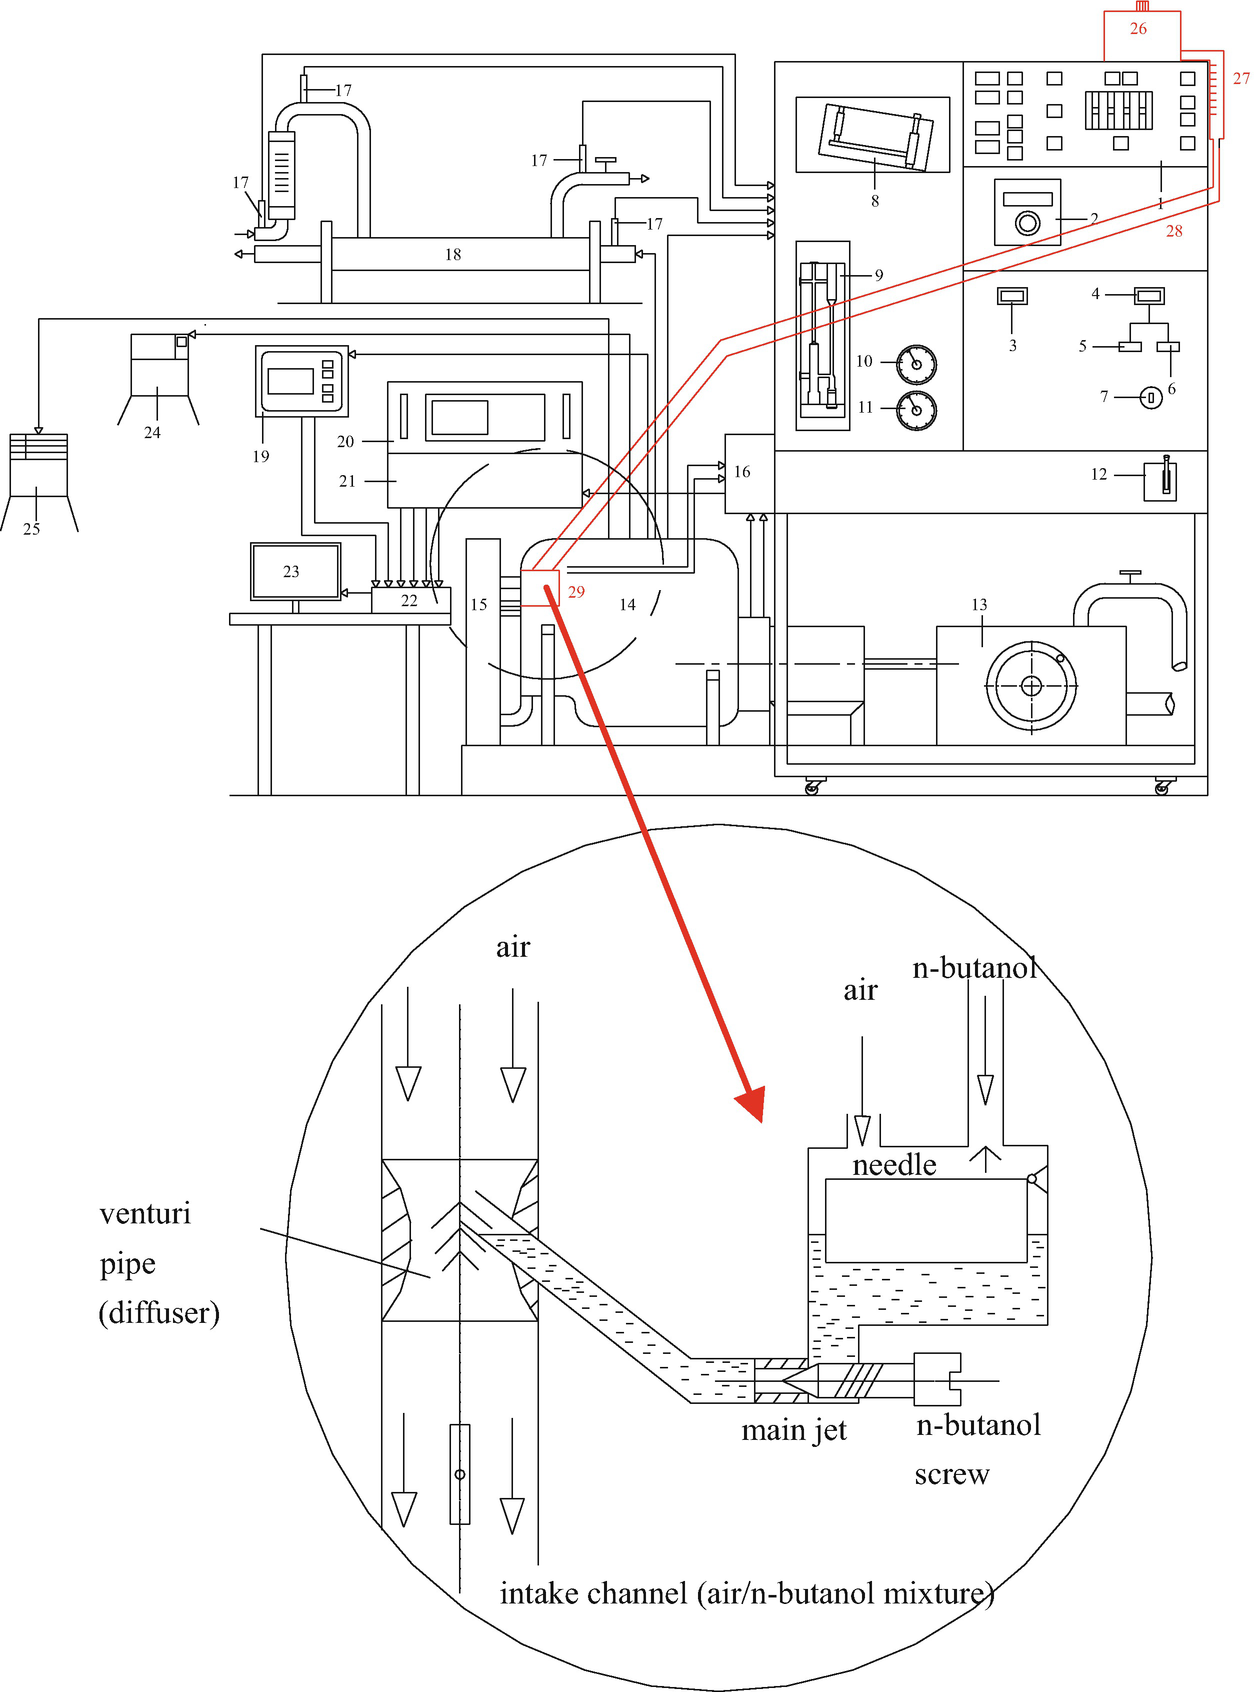 Experimental Investigation Of N Butanol Diesel Fuel Blends And N Butanol Fumigation Evaluation Of Engine Performance Exhaust Emissions And Heat Release Springerlink